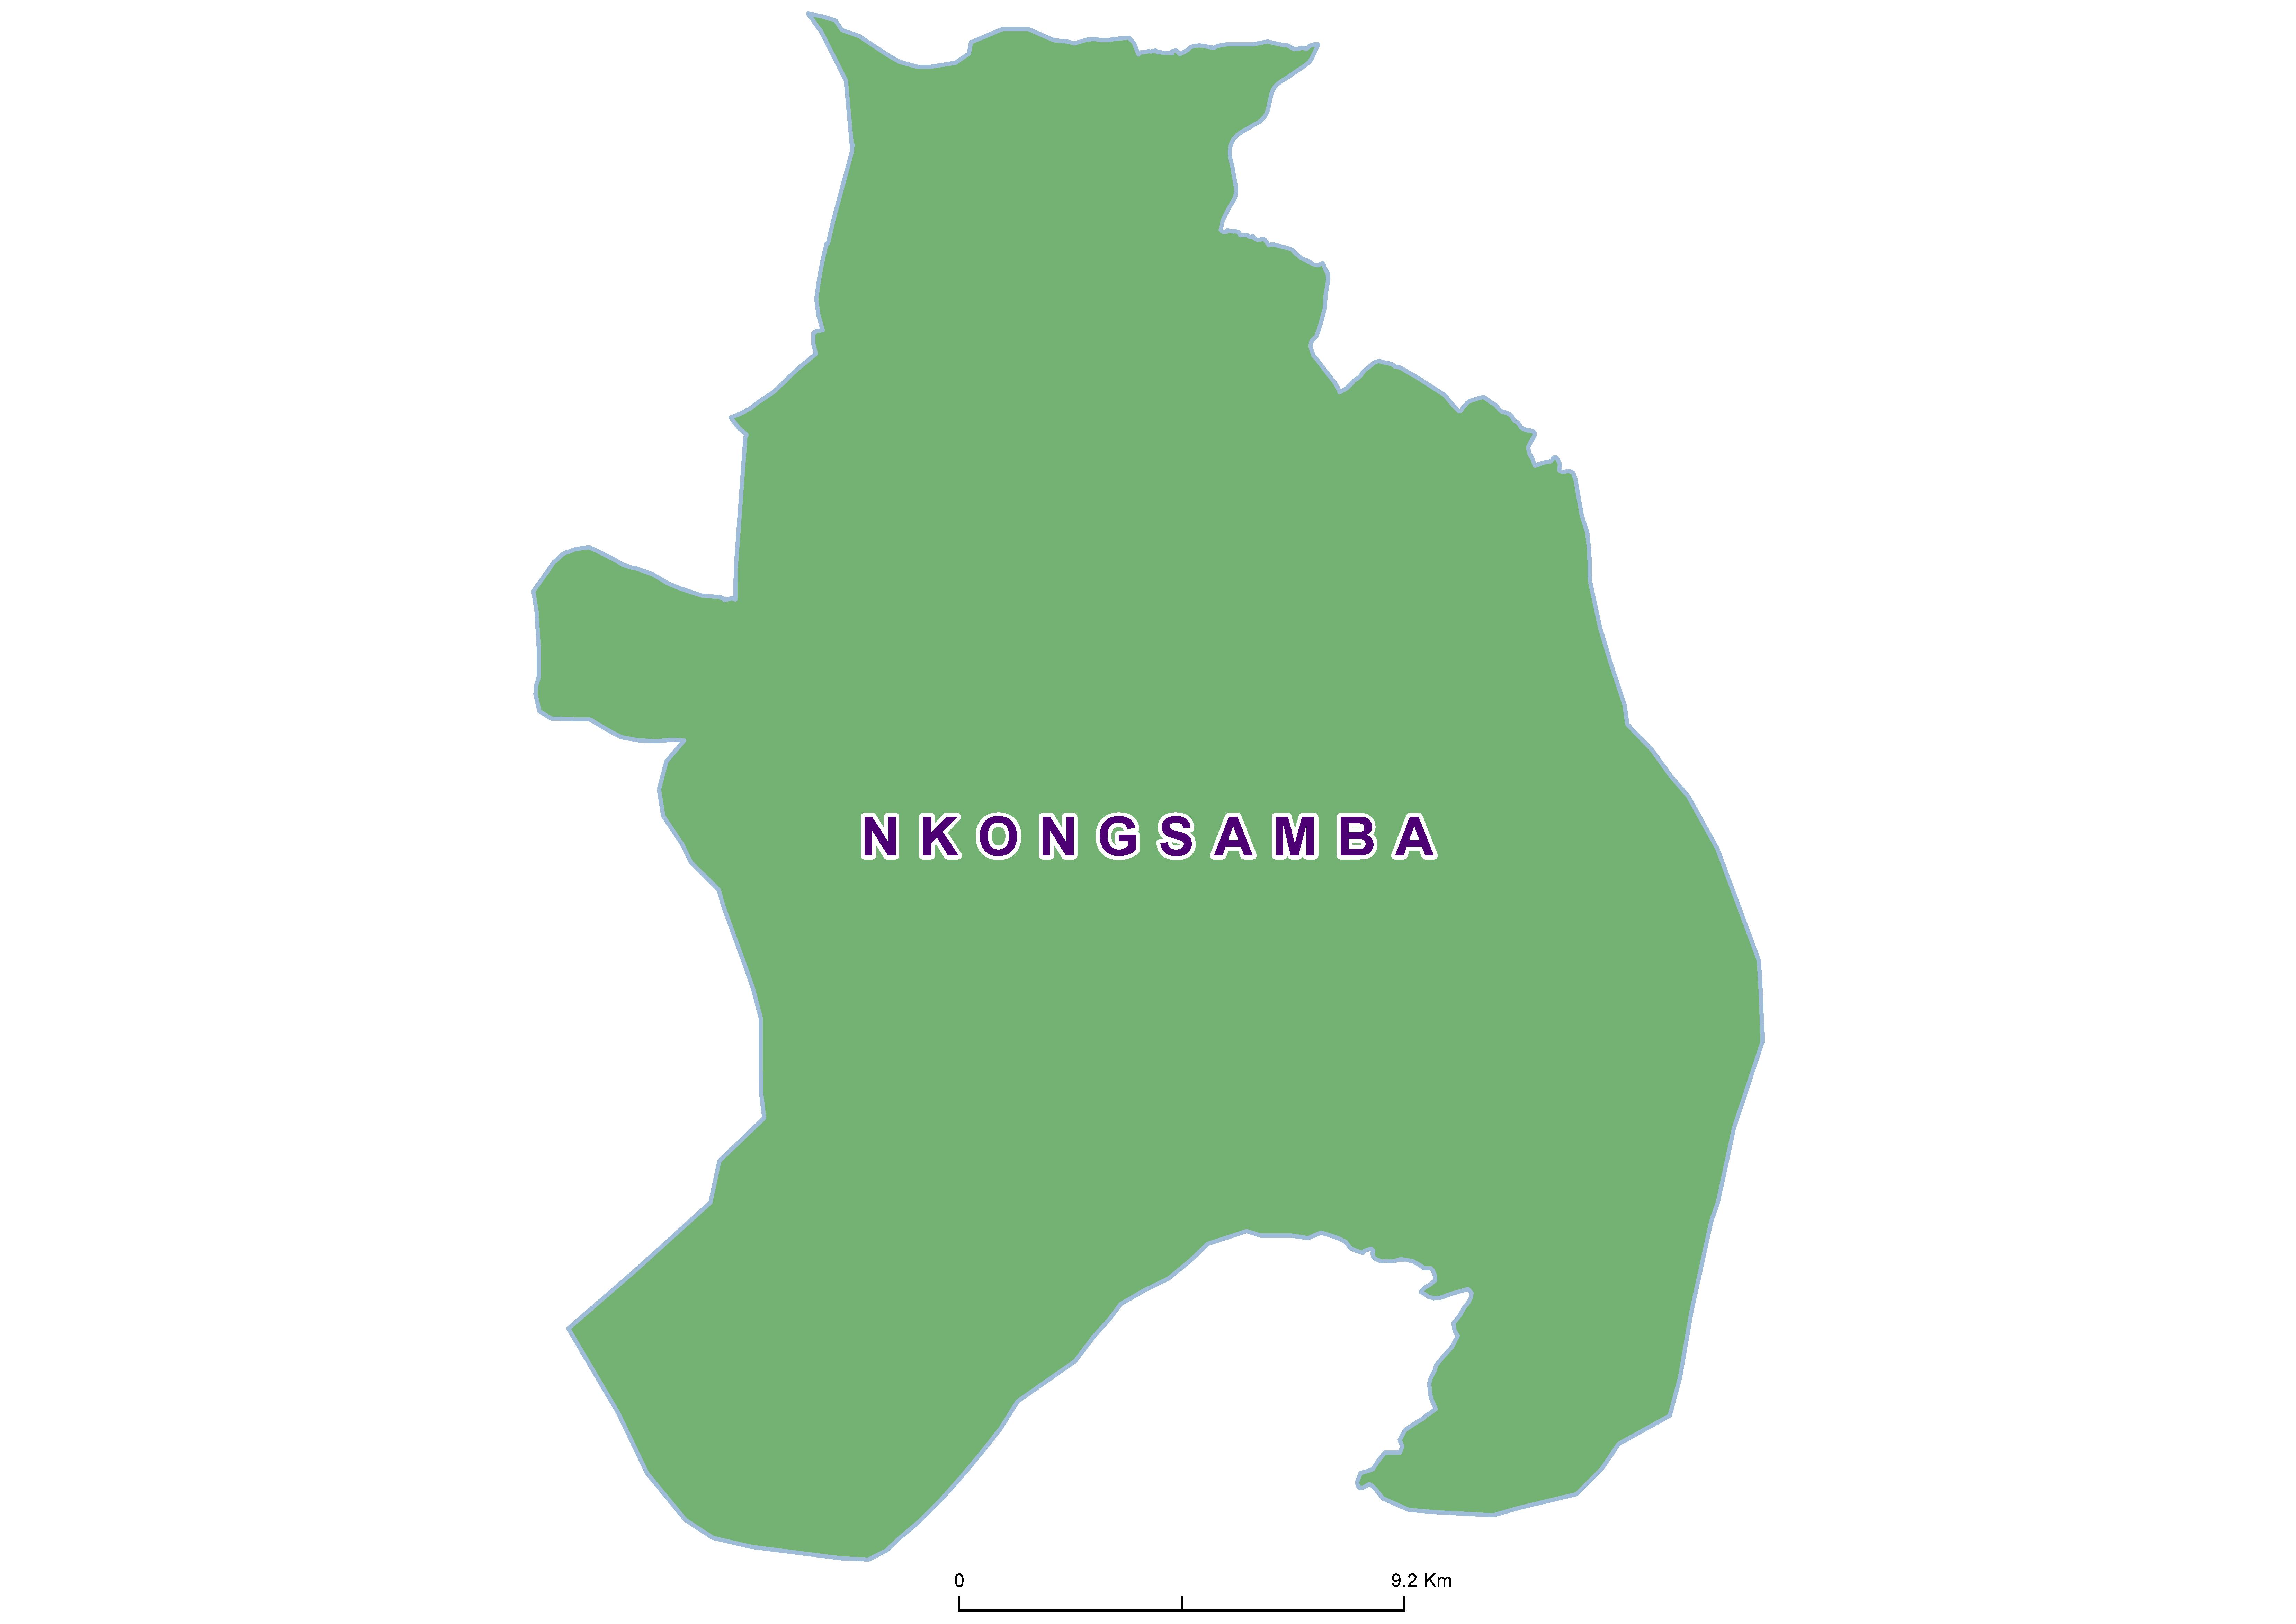 Nkongsamba Mean SCH 20100001